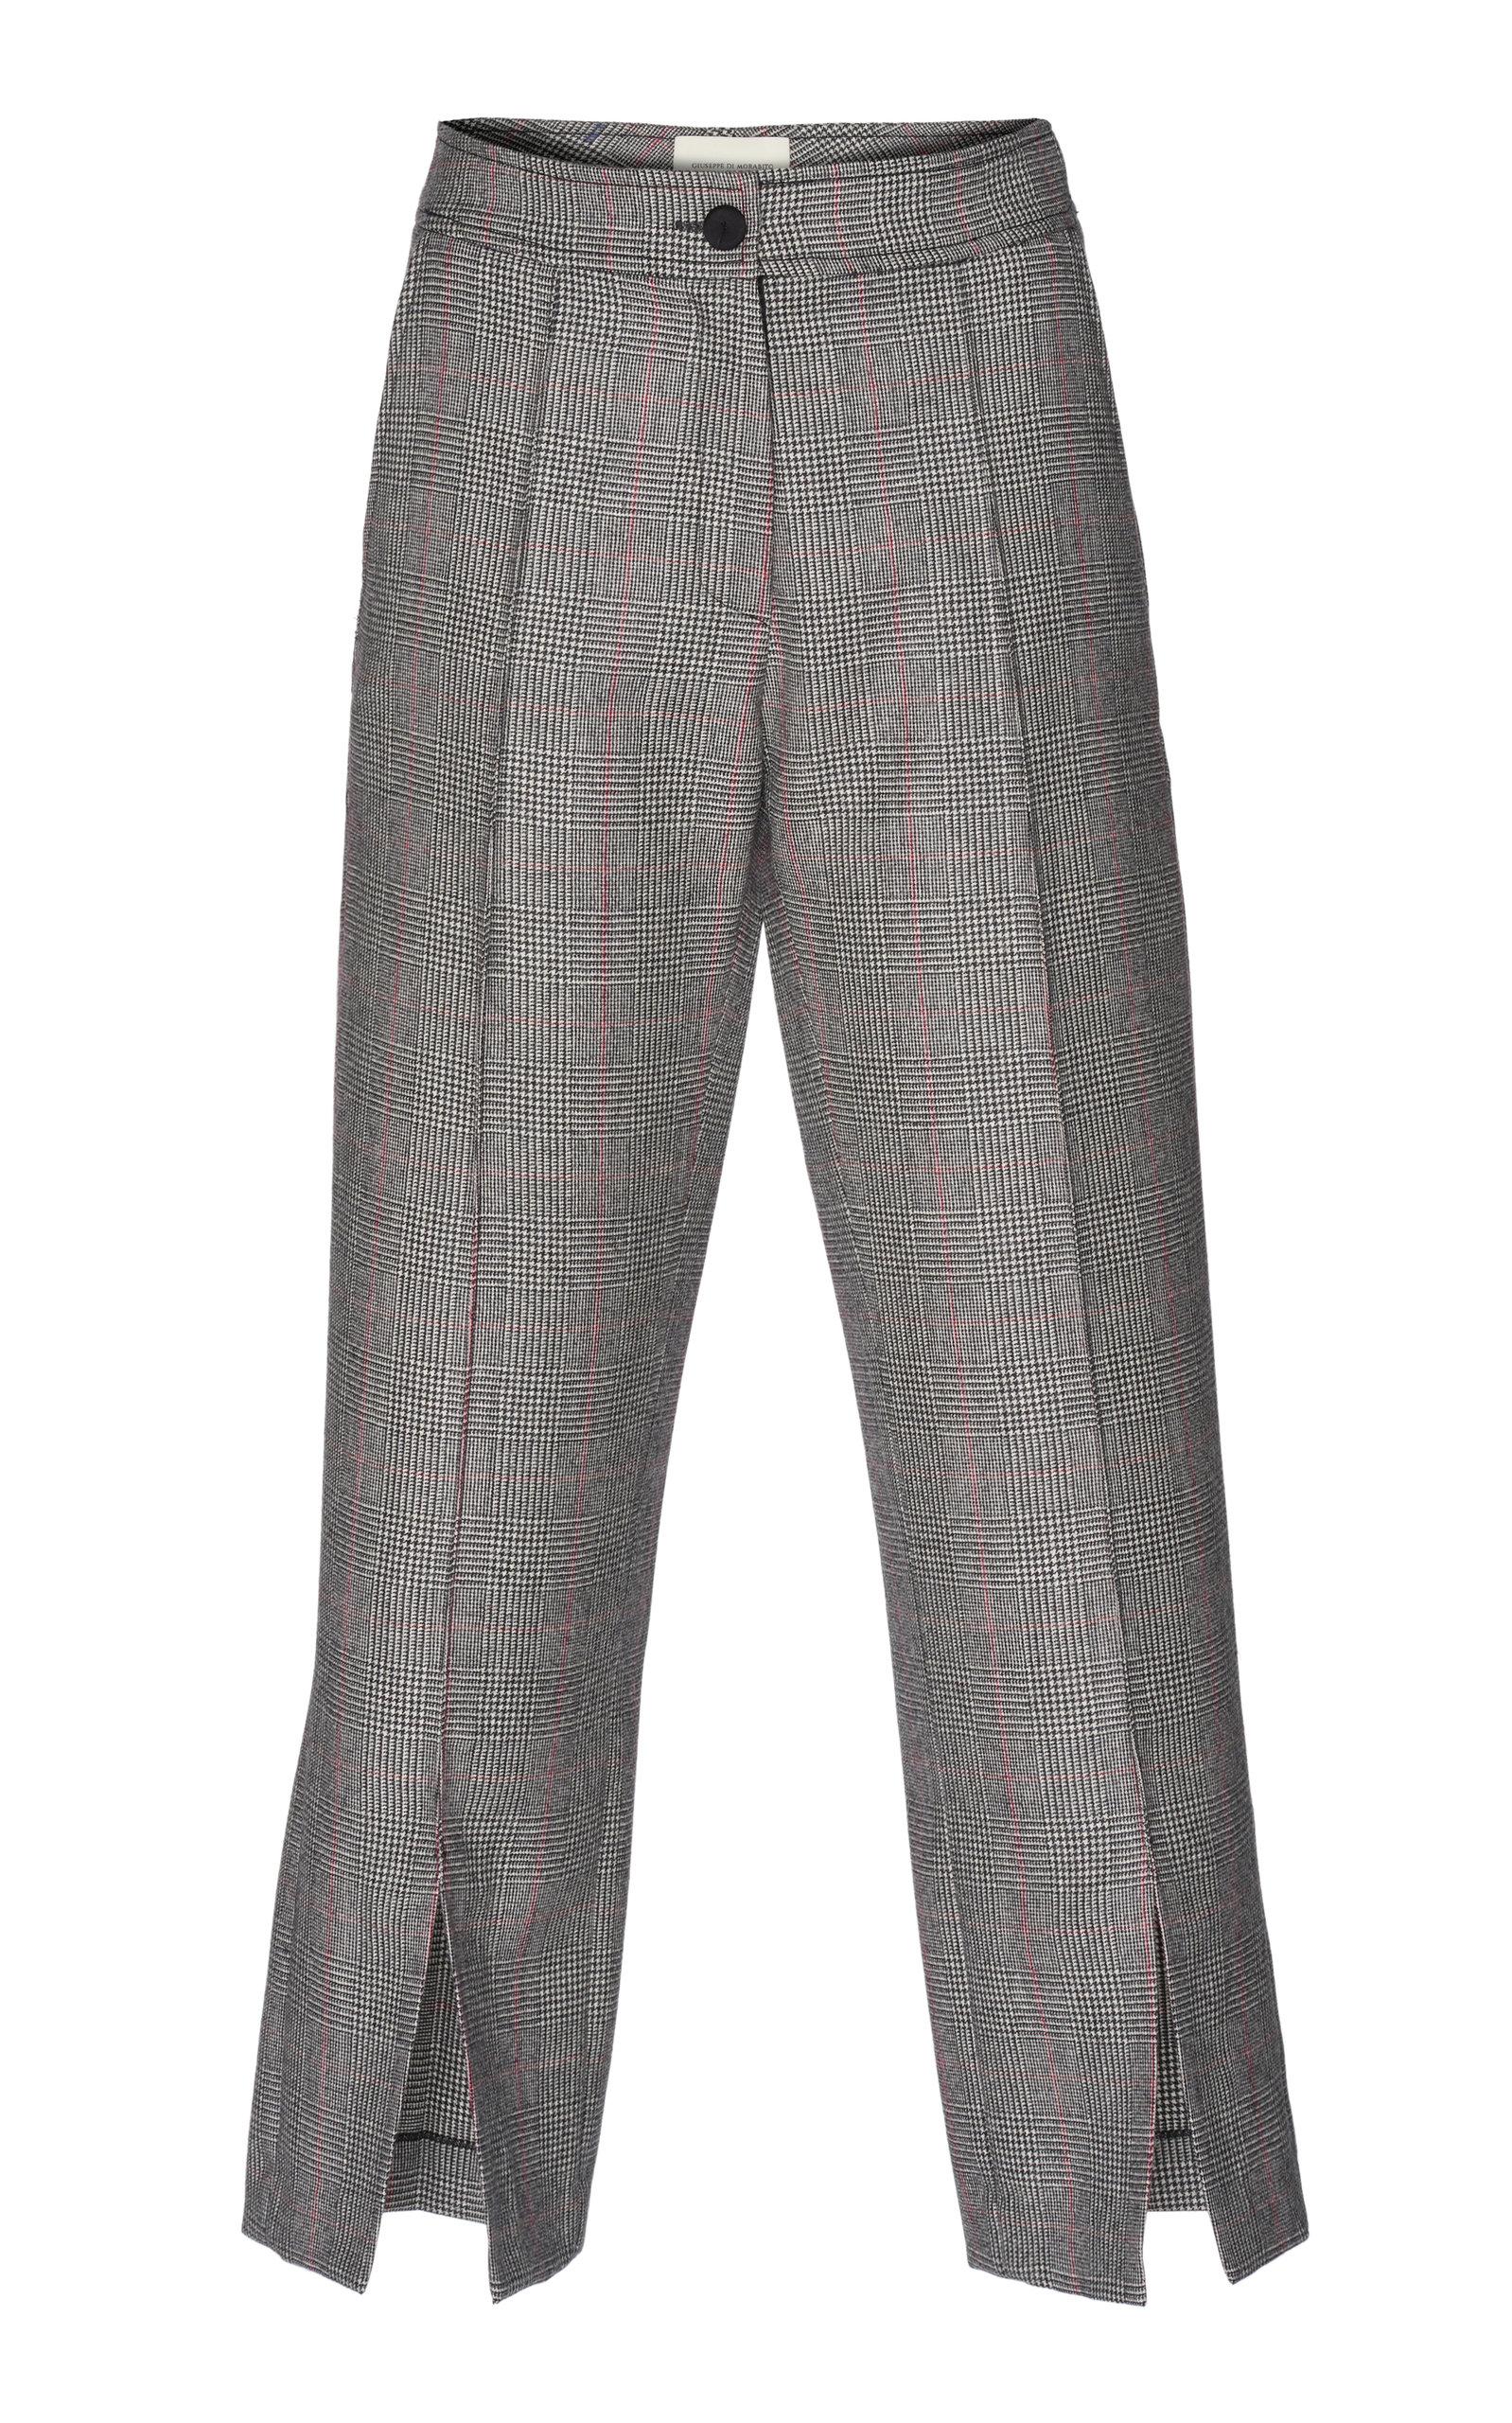 GIUSEPPE DI MORABITO Check Design Trouser in Grey